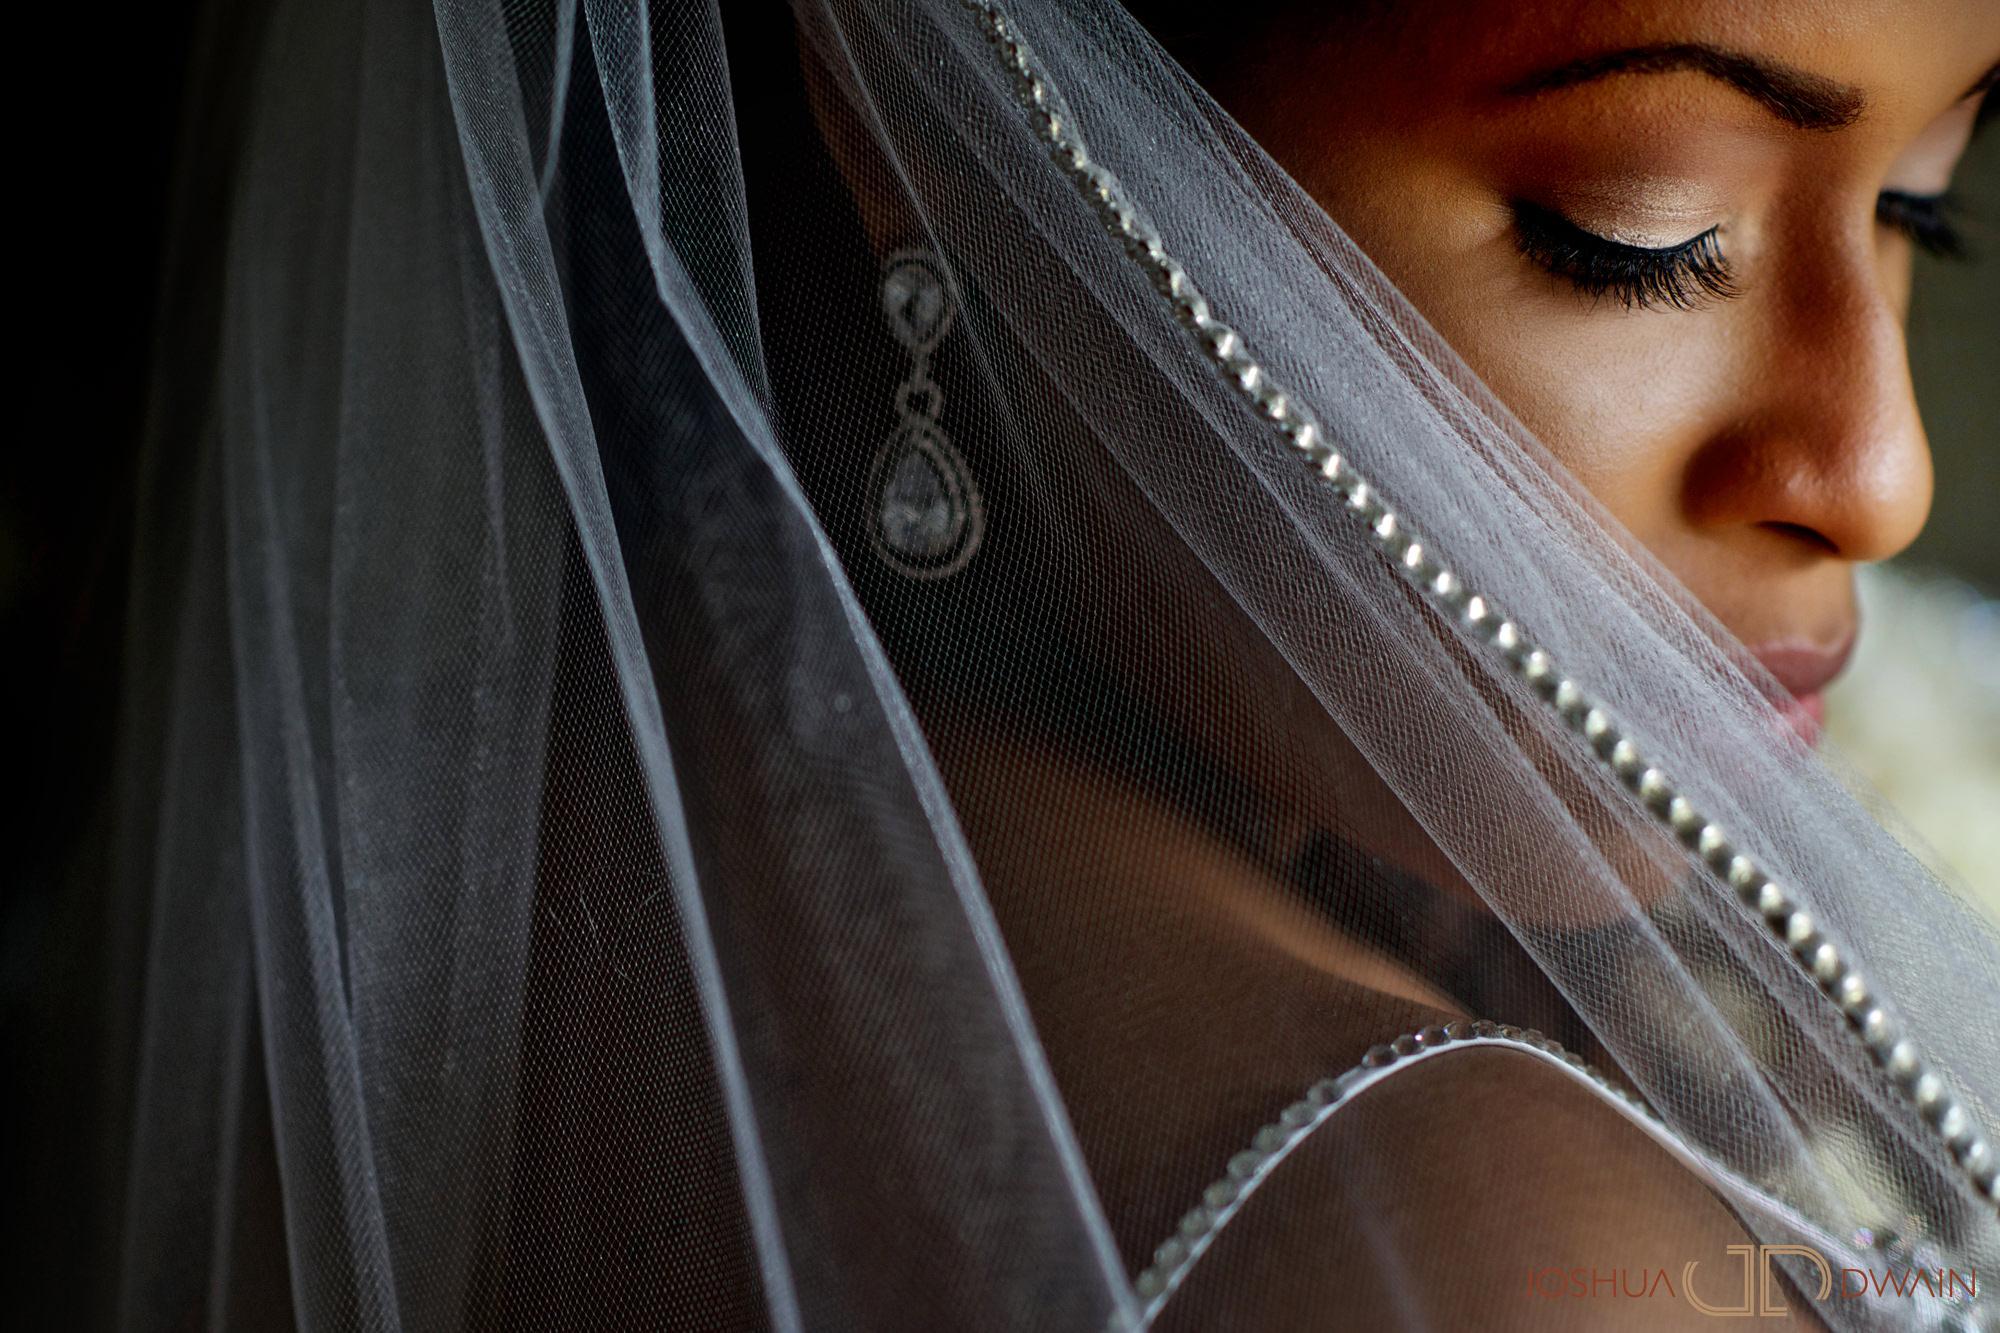 cadisha-antoine-009-ashford-estates-allentown-nj-wedding-photographer-joshua-dwain-photography-